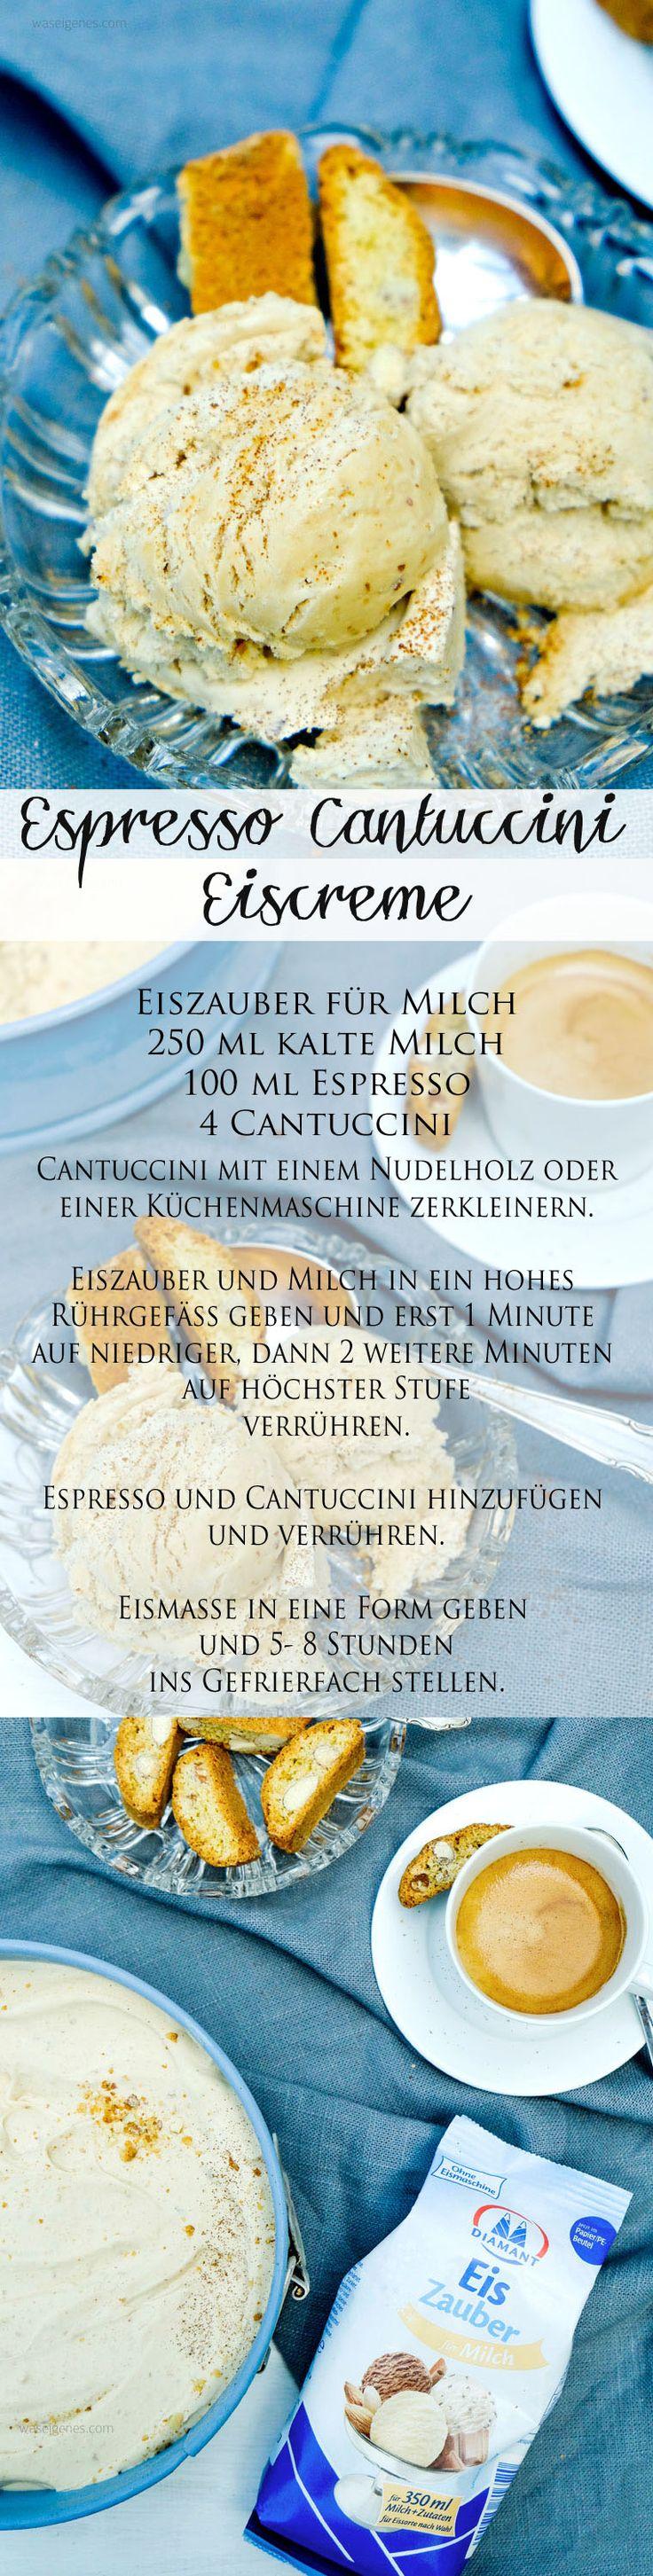 rezept selbstgemachtes espresso cantuccini eis ohne eismaschine eis eis baby. Black Bedroom Furniture Sets. Home Design Ideas